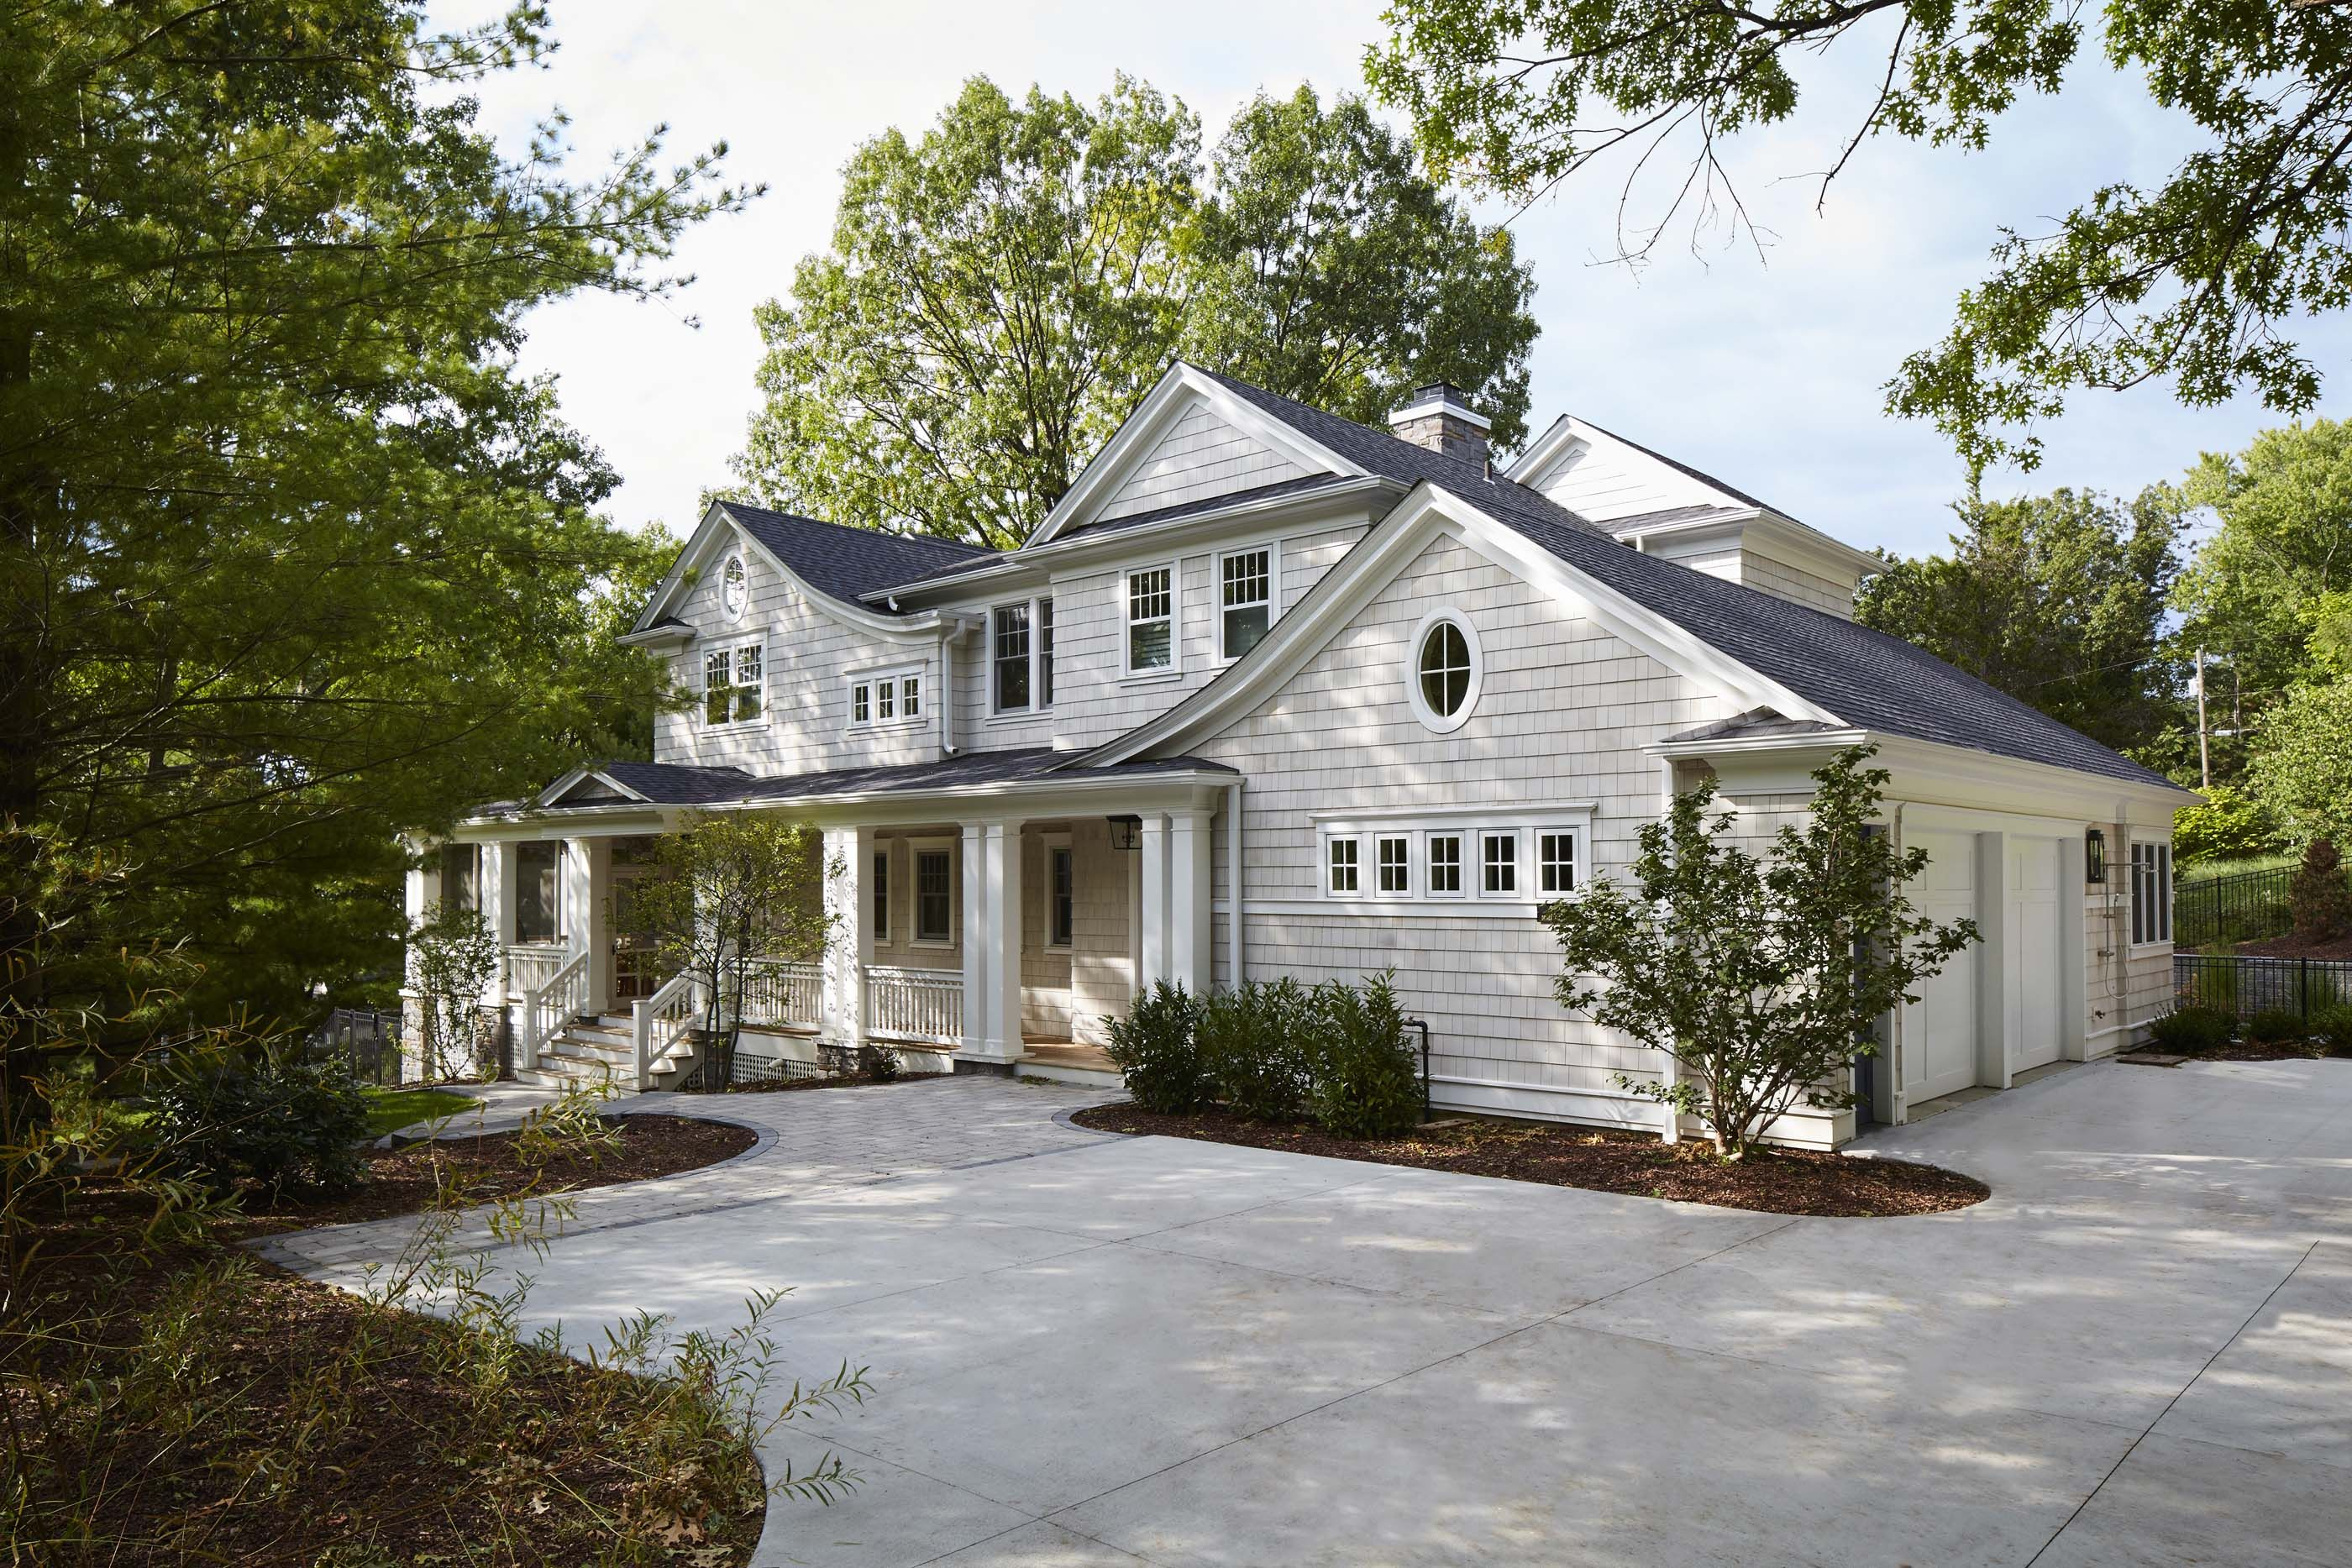 Lakeside Vacation Home Shingle Style Architecture